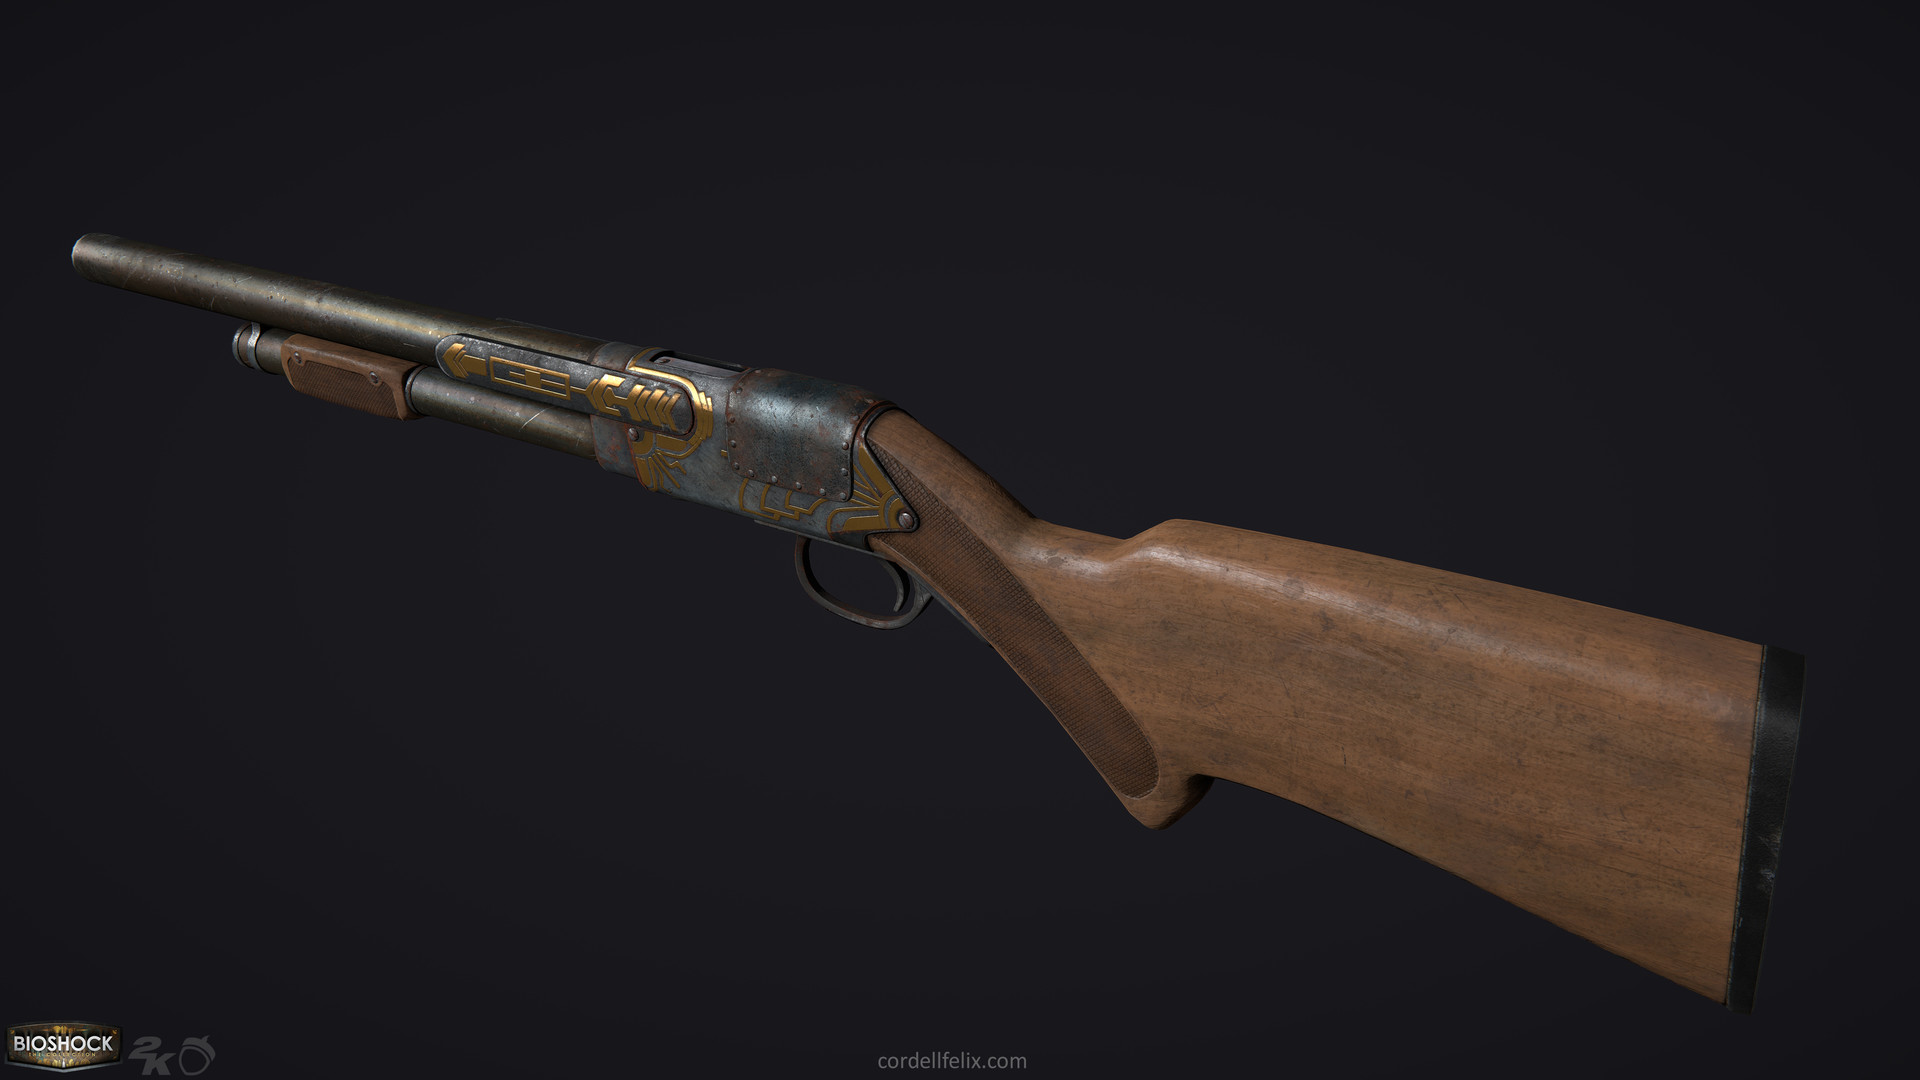 Cordell felix cordellfelix shotgun 06